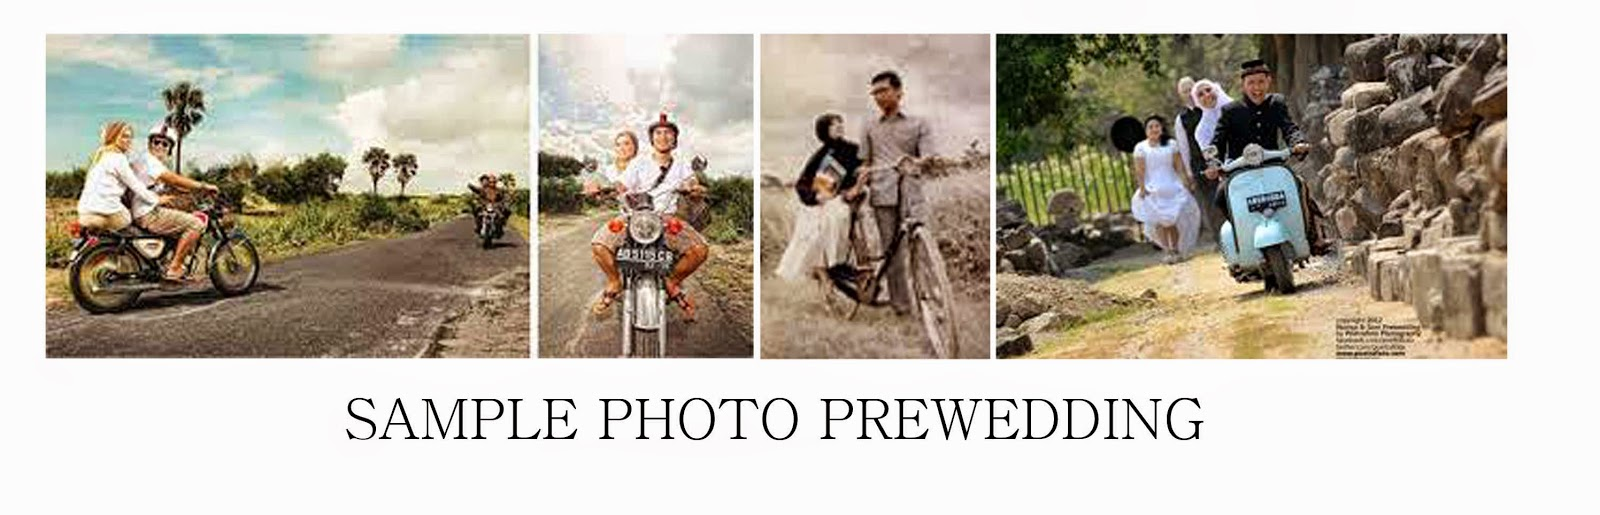 gambar pre wedding,contoh foto pre wedding di pantai,contoh foto pre